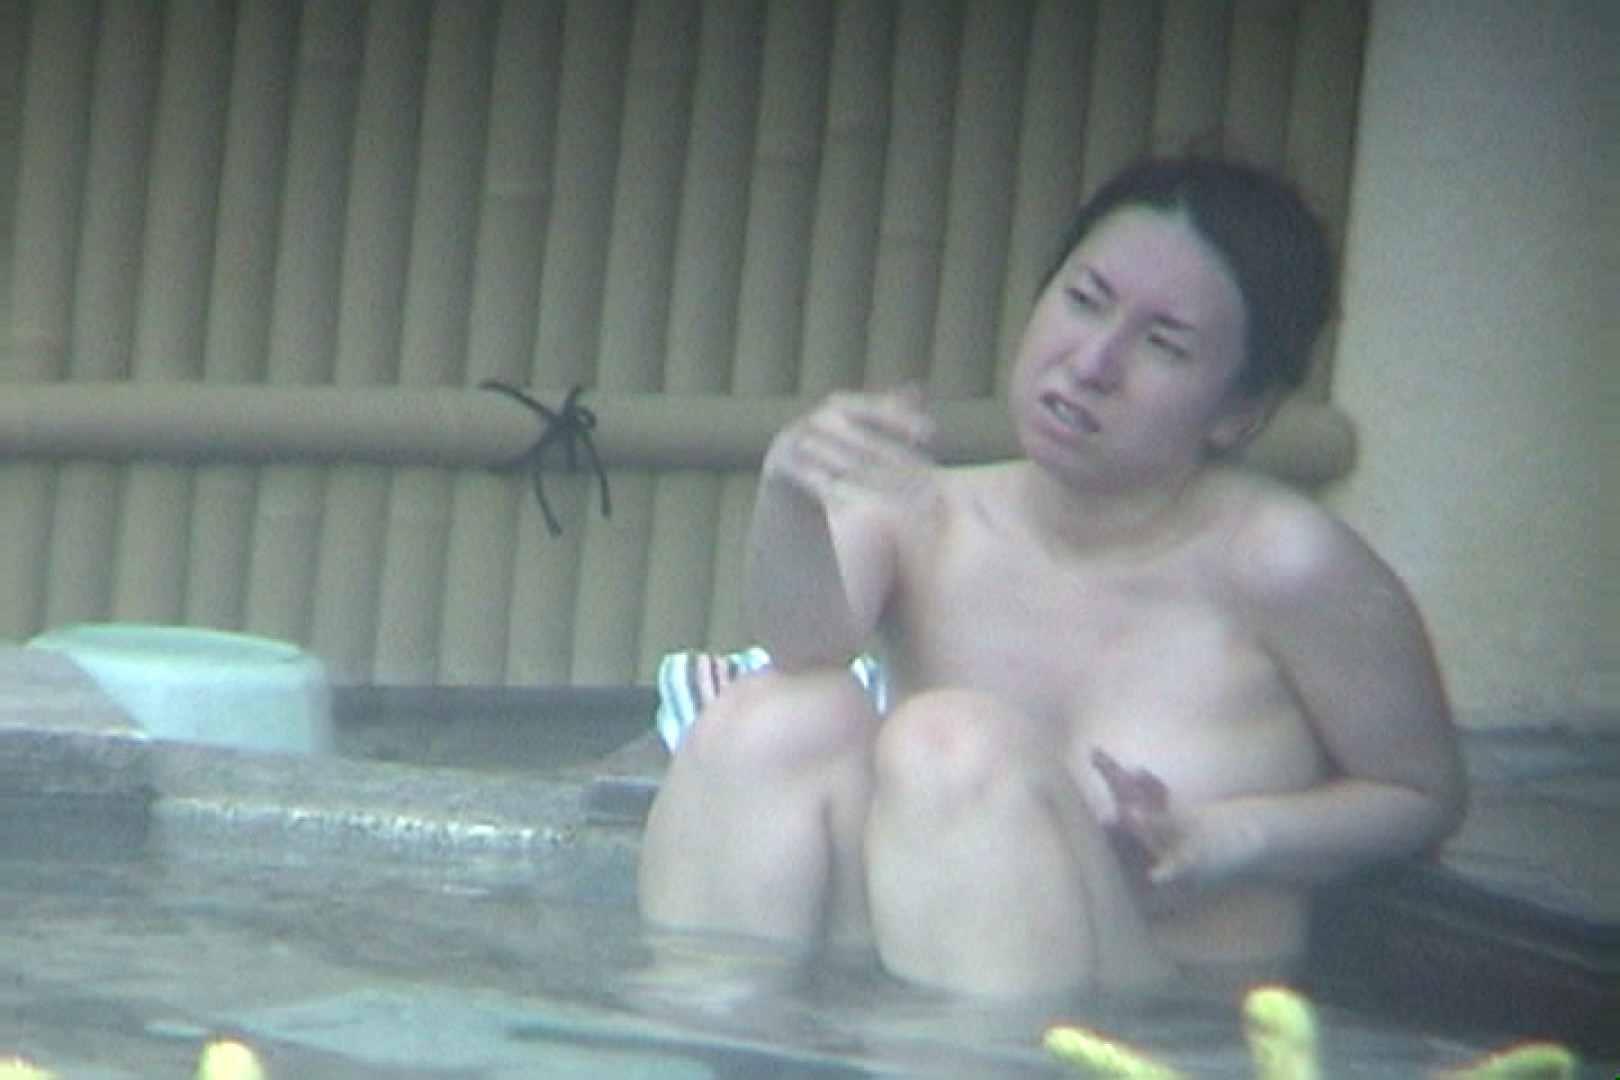 Aquaな露天風呂Vol.106 盗撮シリーズ | 露天風呂編  86PIX 45